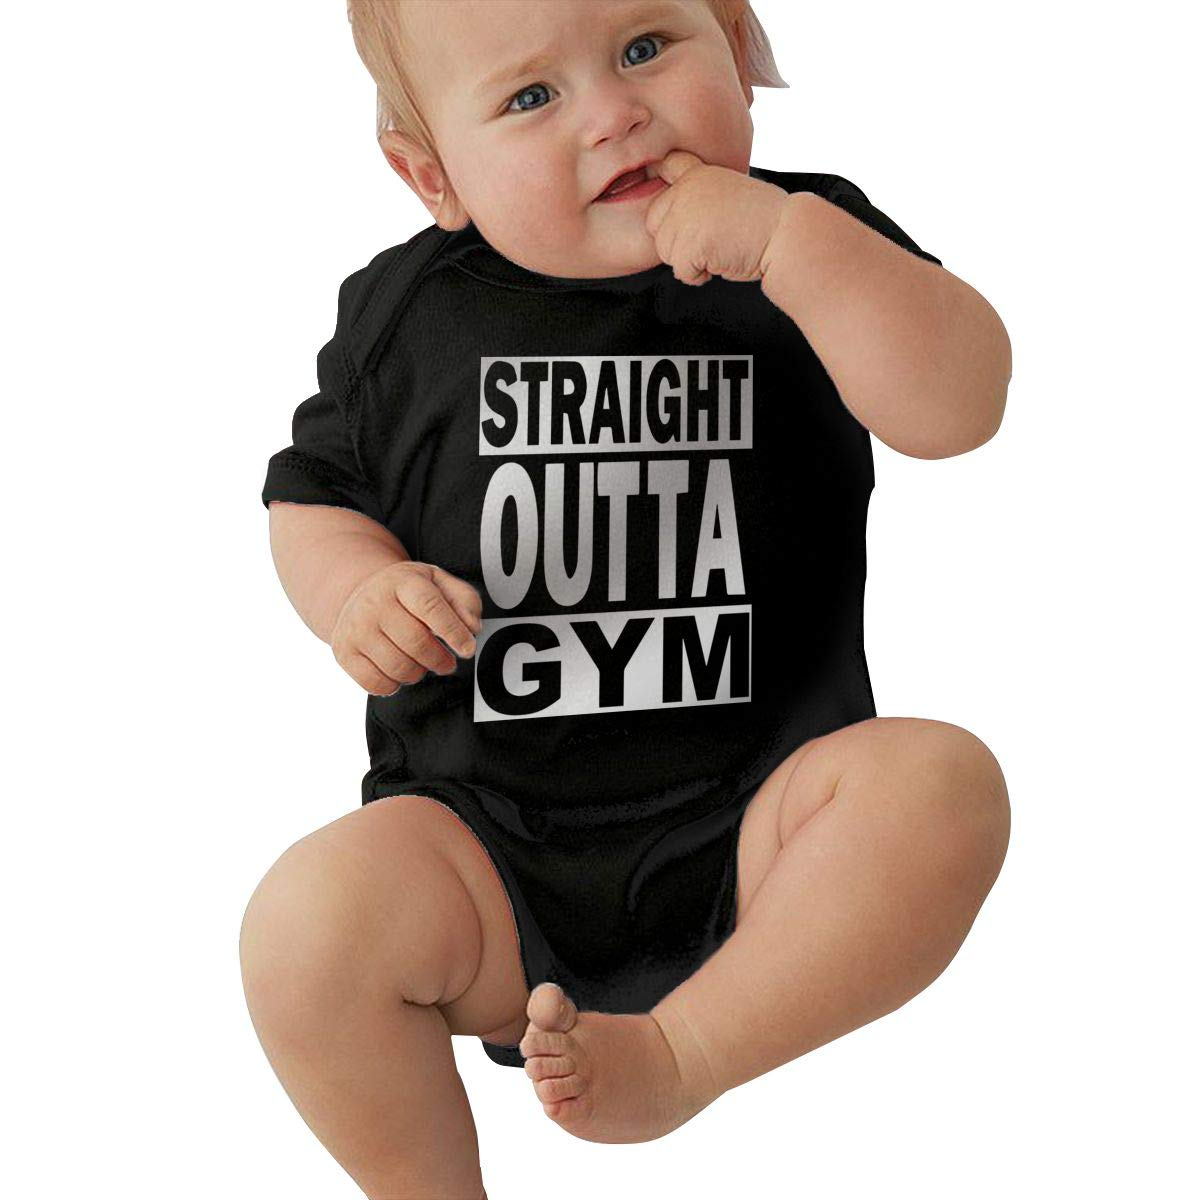 Newborn Baby Girls Bodysuit Short-Sleeve Onesie Straight Outta Gym Print Outfit Spring Pajamas